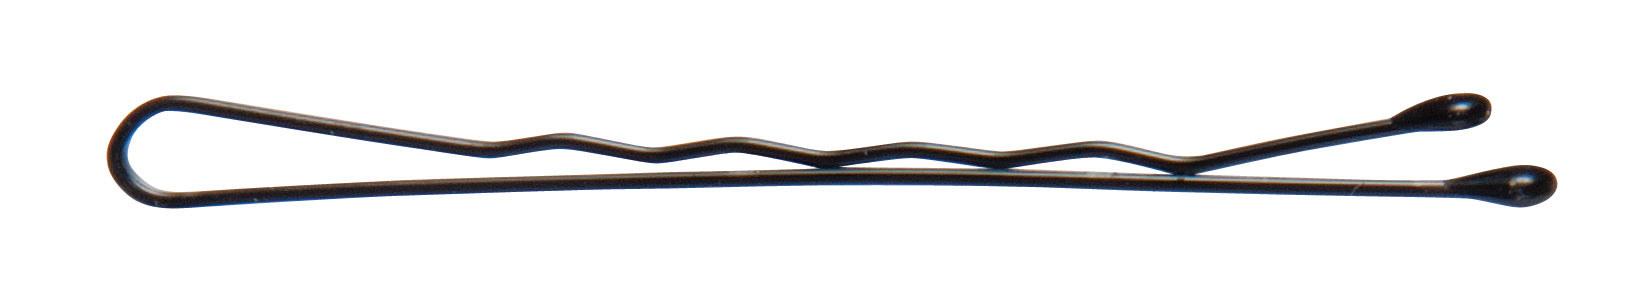 A black bobby pin